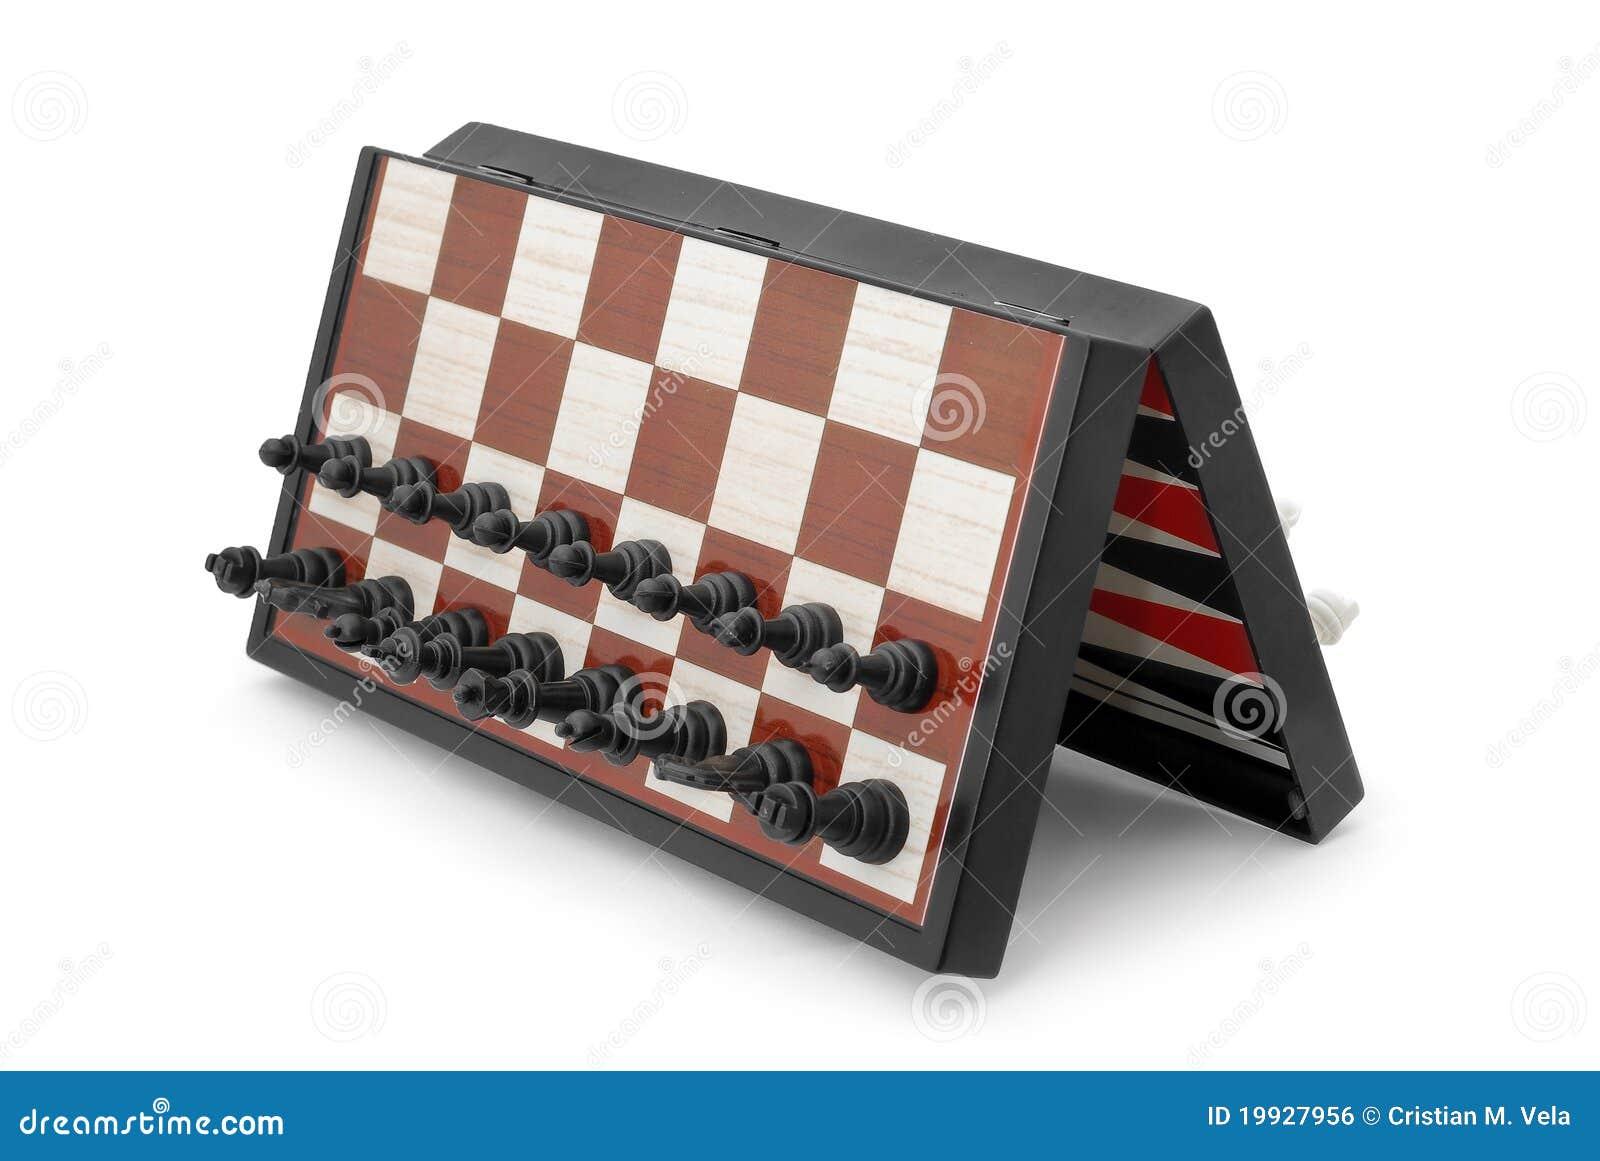 Magnetisch schaak